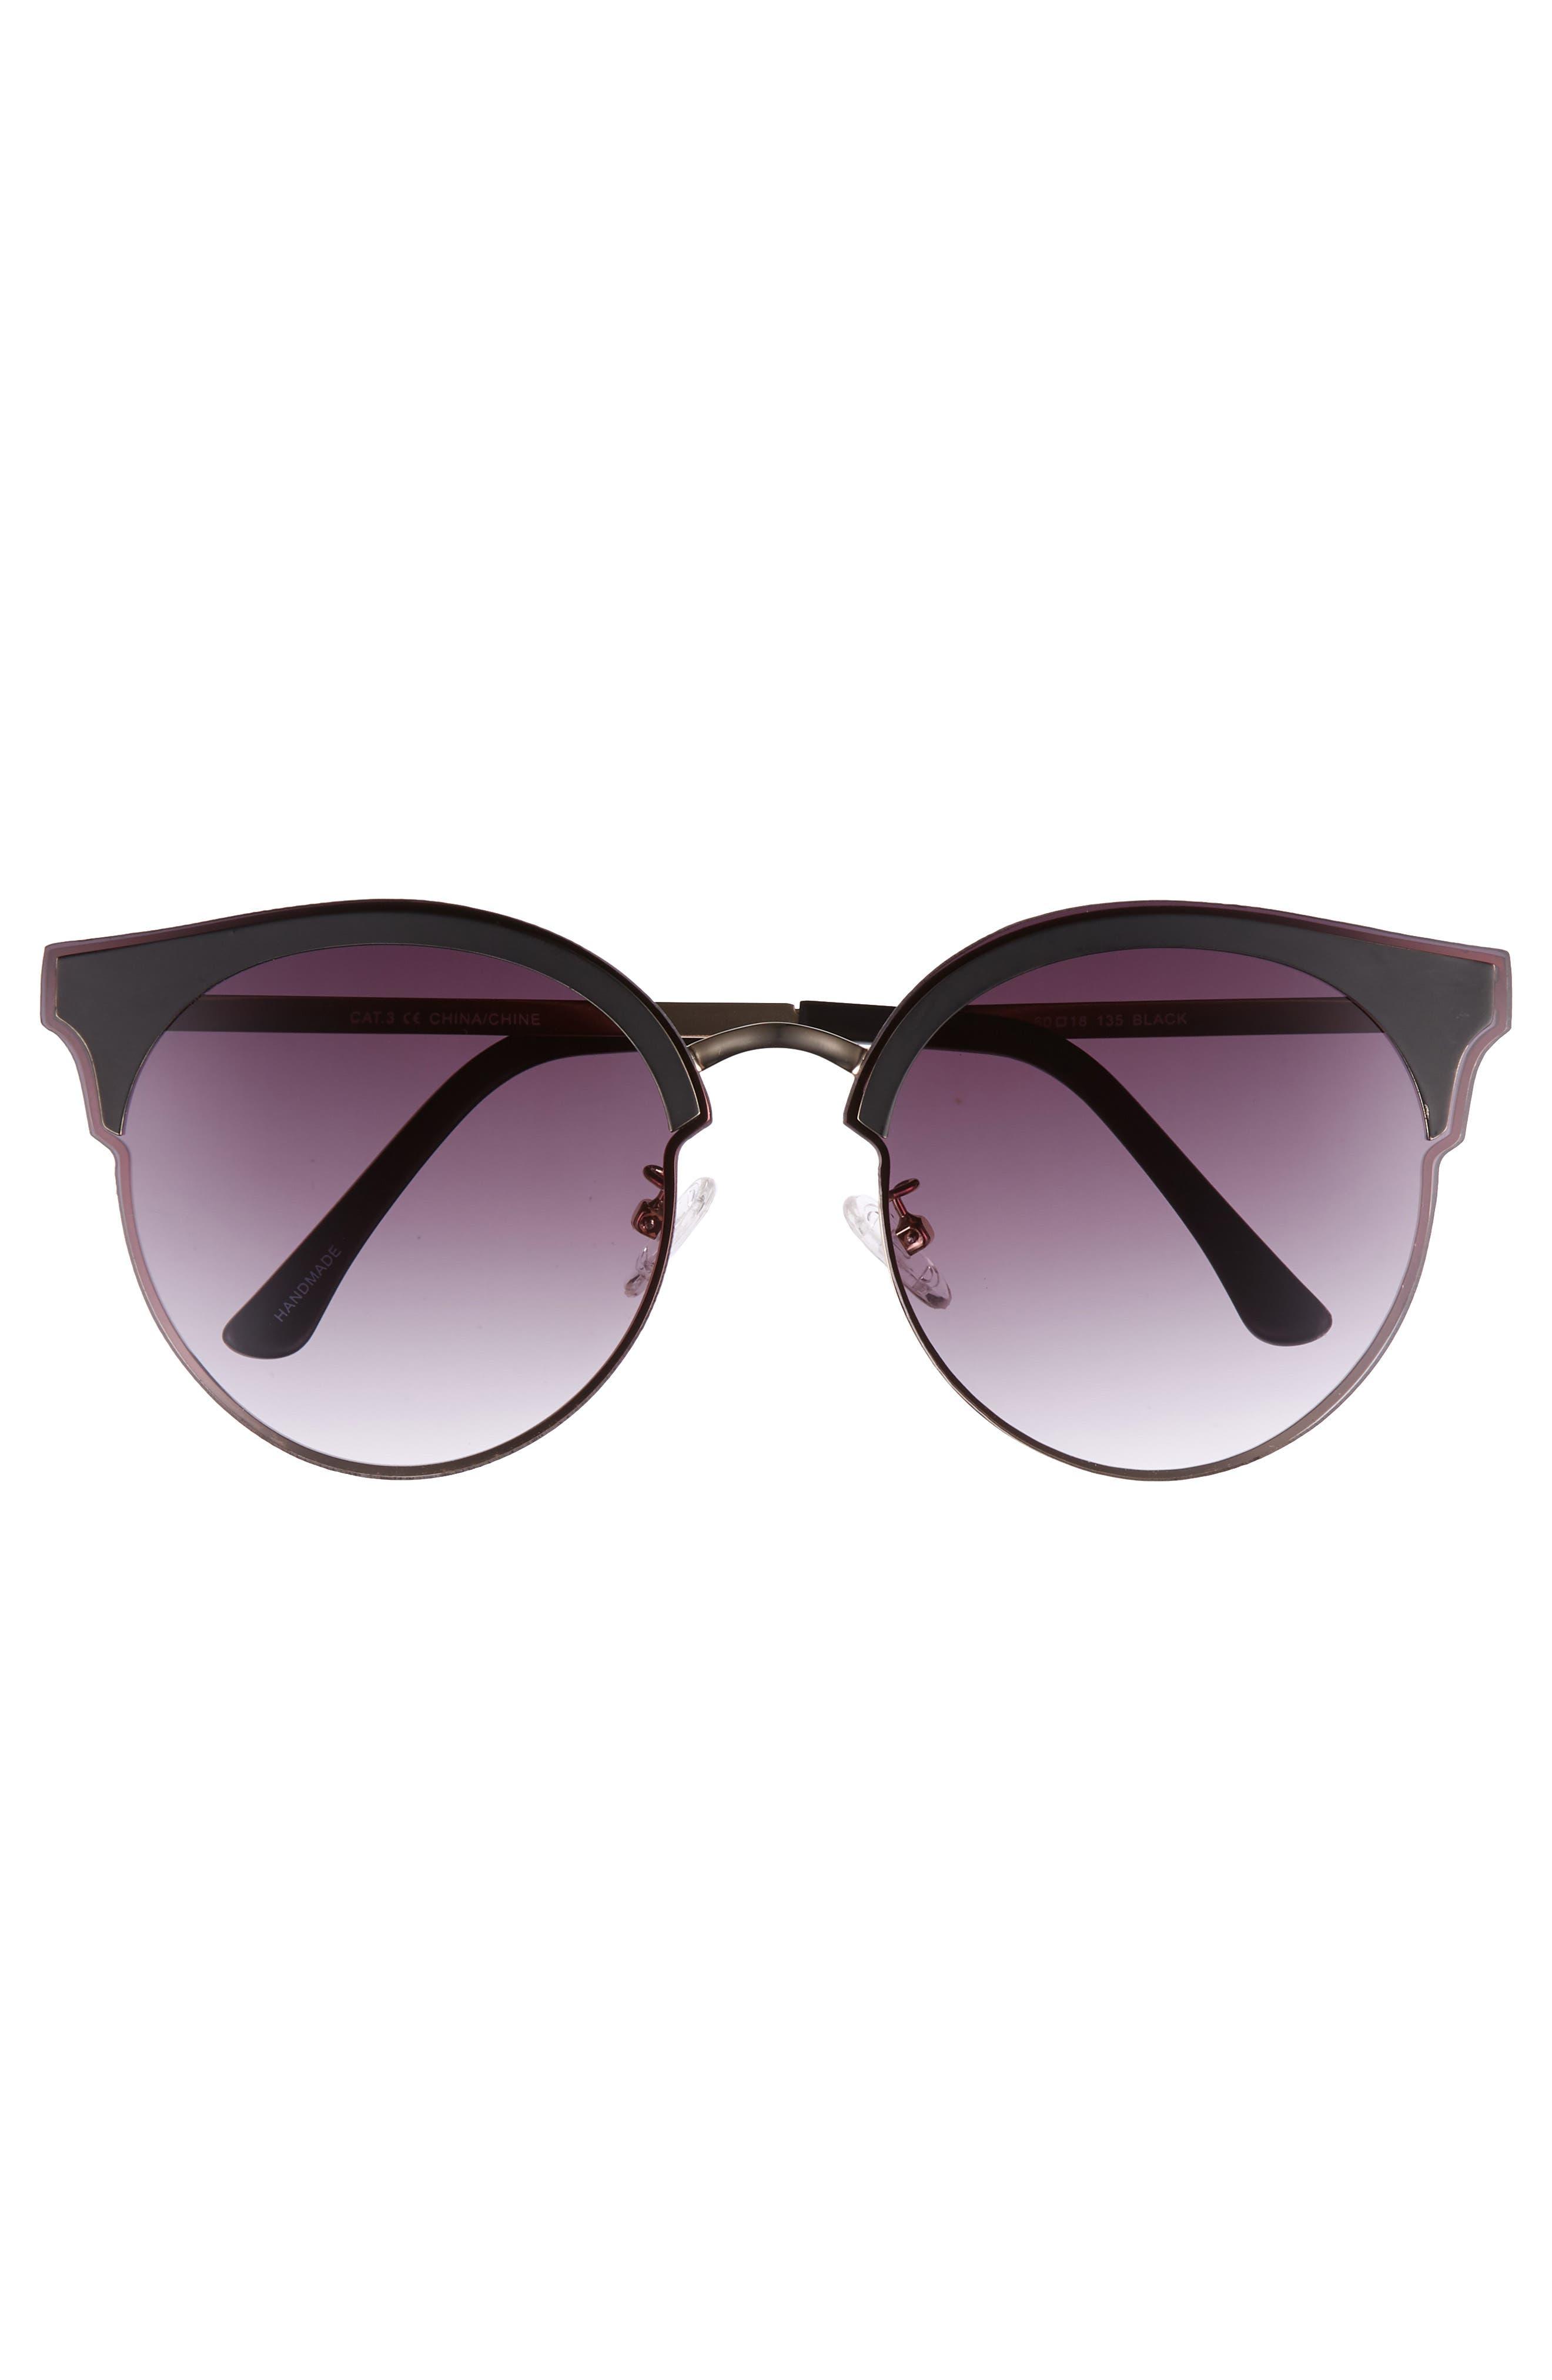 Mia 60mm Sunglasses,                             Alternate thumbnail 3, color,                             001